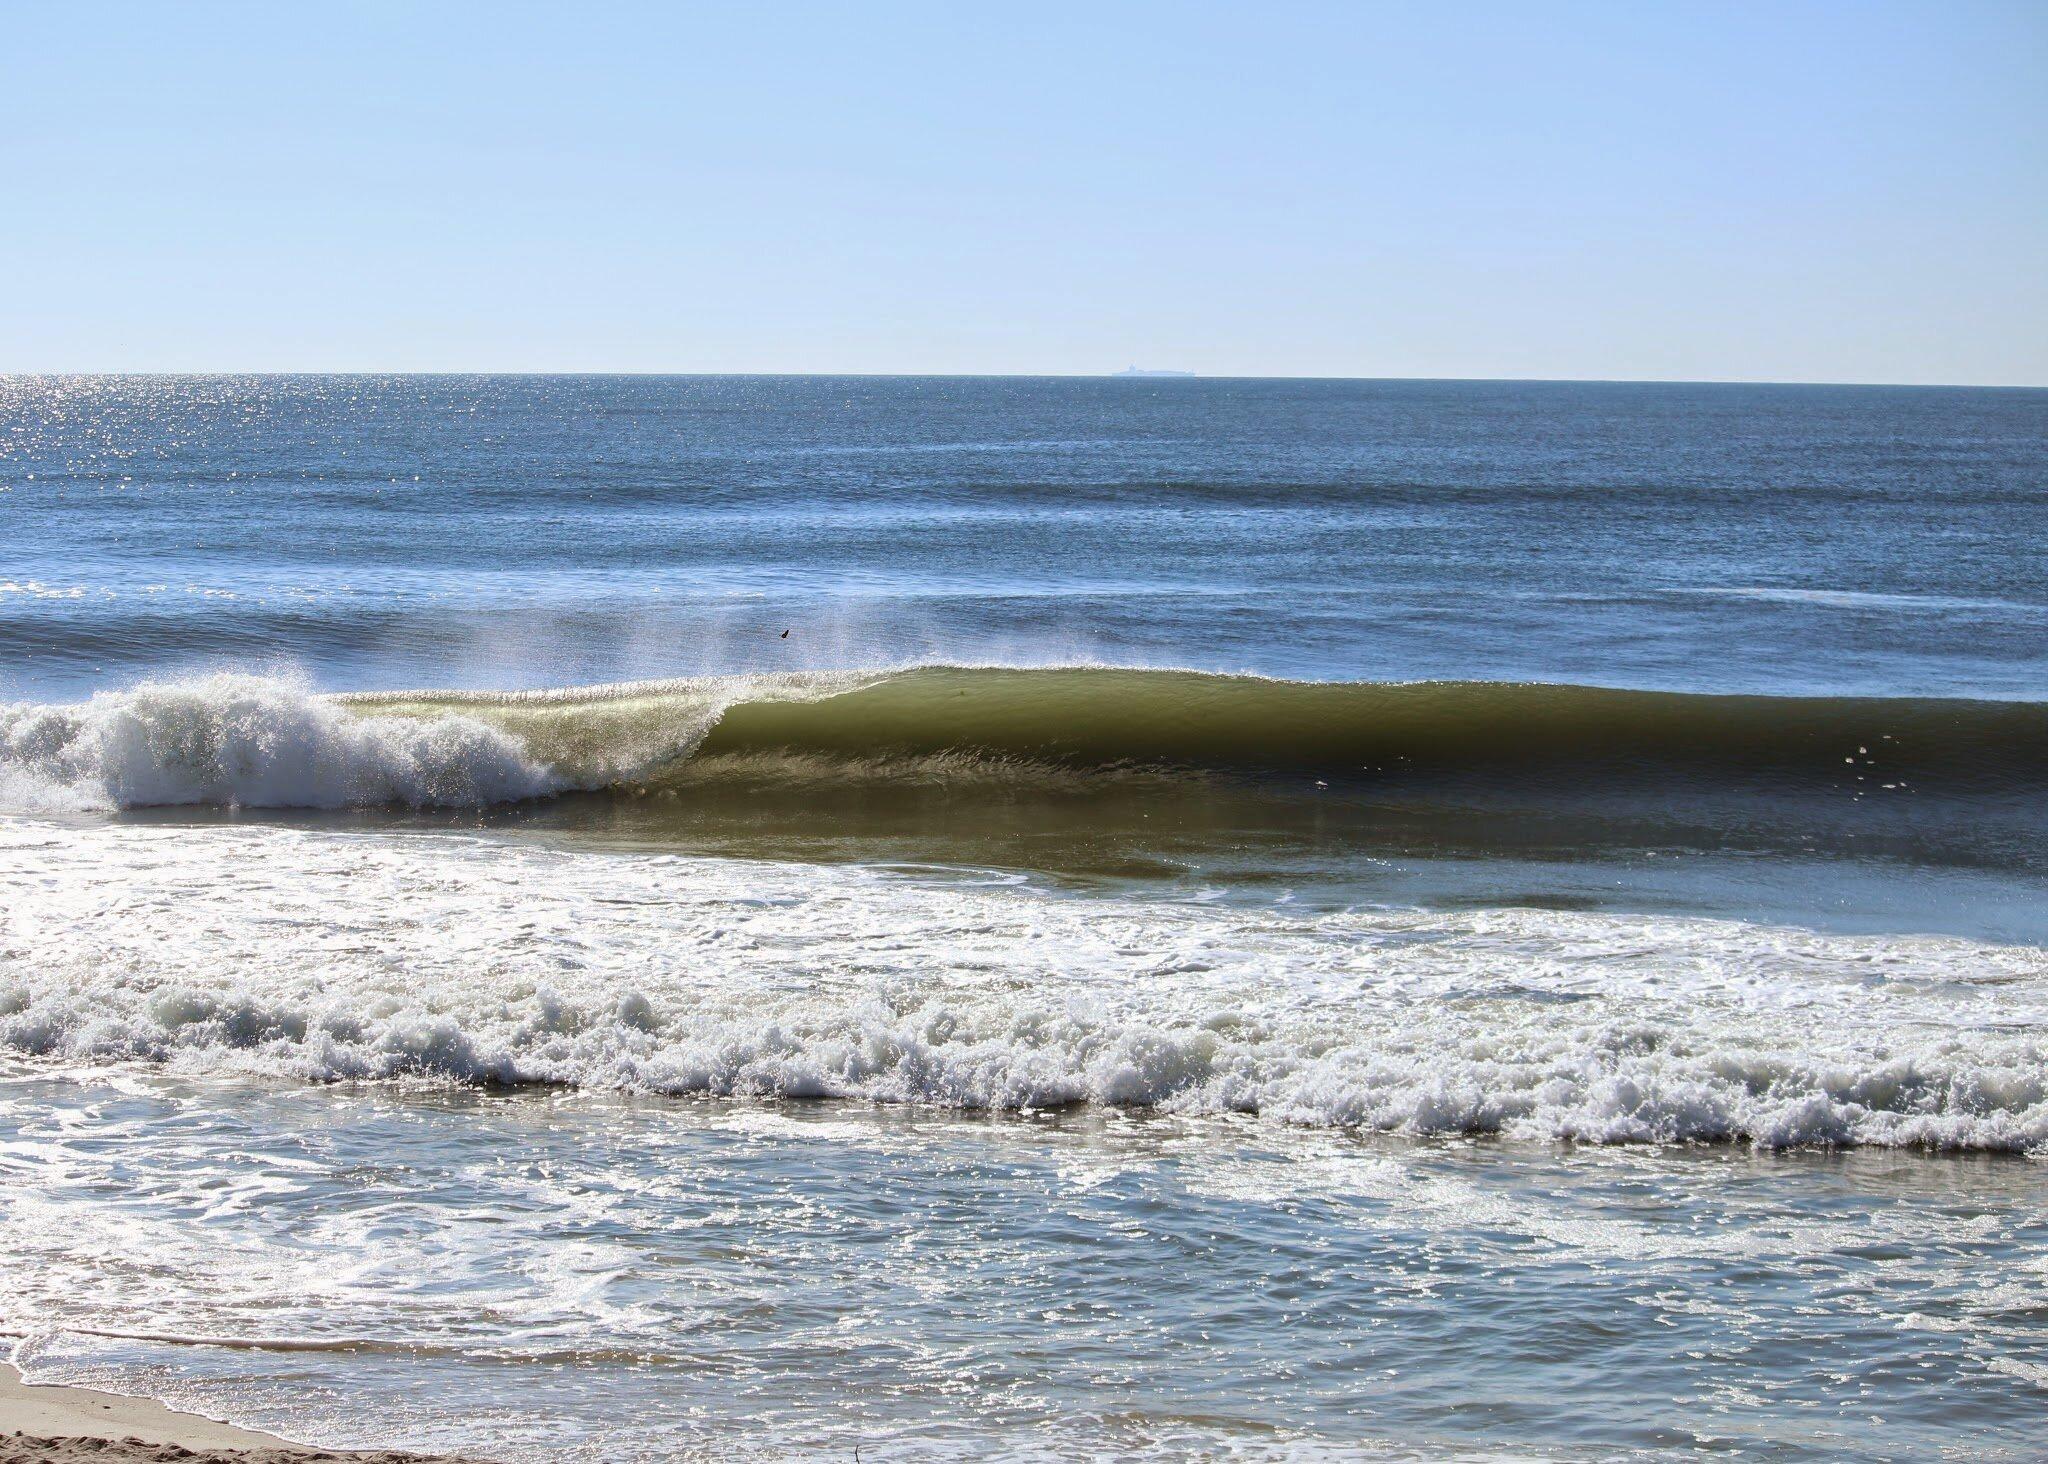 ocean wave with monarch.jpg